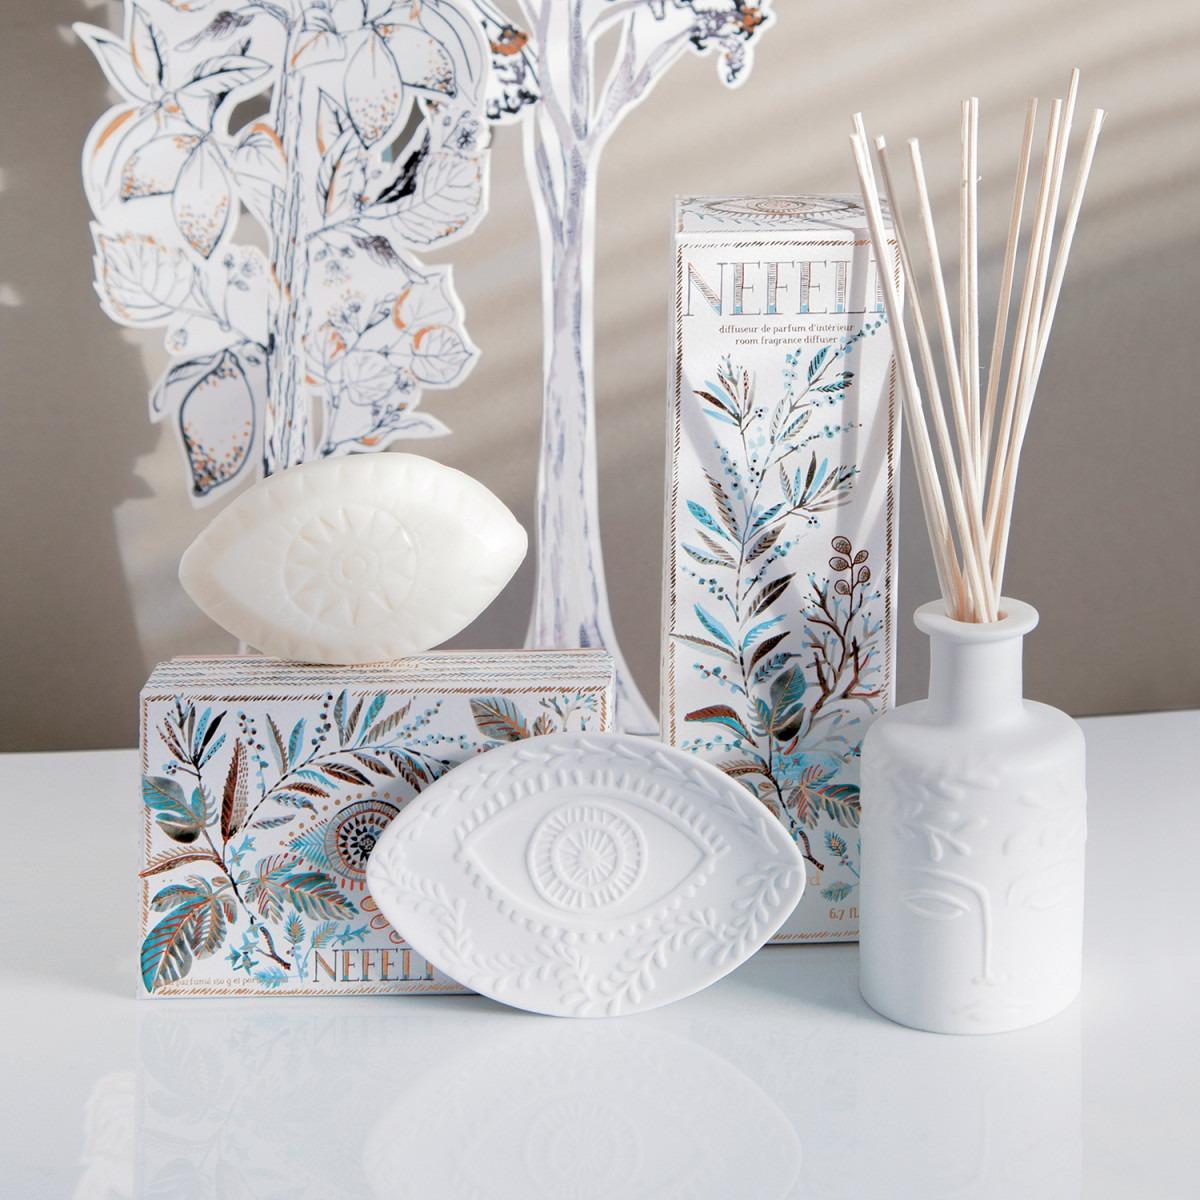 Fragonard Nefeli Soap & Soap Dish Set